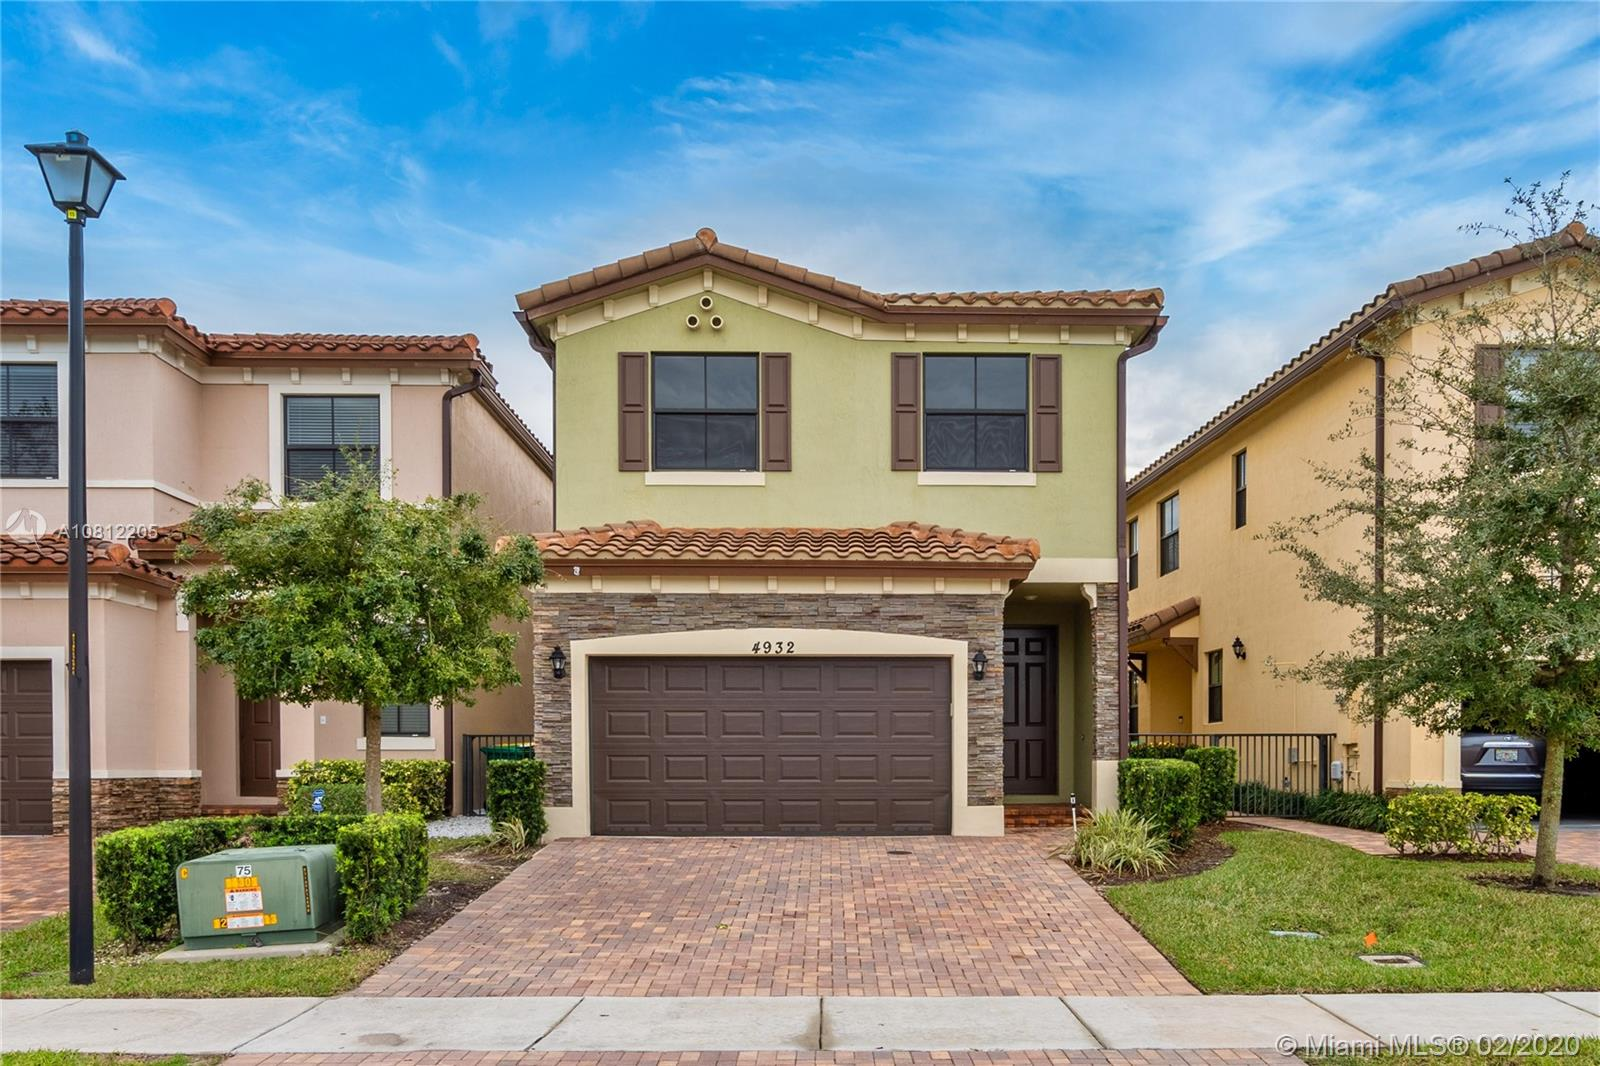 4932 NW 57th Ct, Tamarac, FL 33319 - Tamarac, FL real estate listing